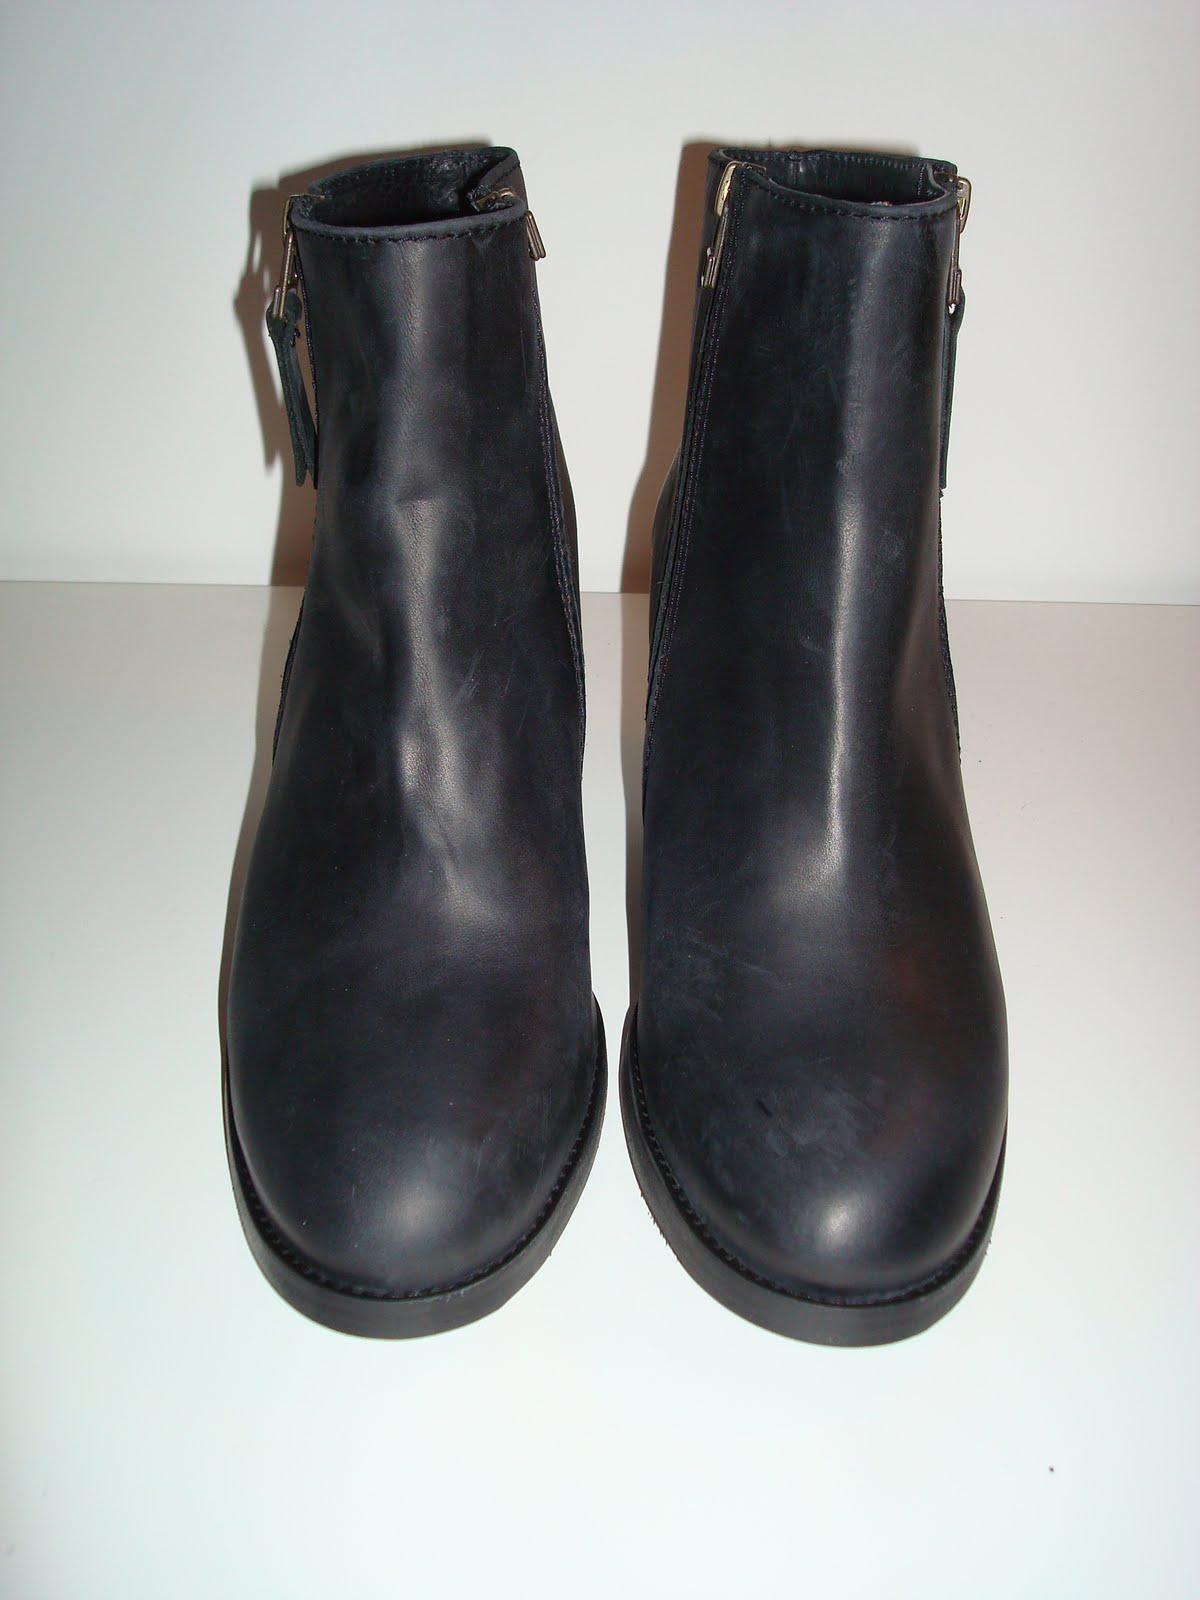 Independent in heels: New In: Sacha 'pistol' boots